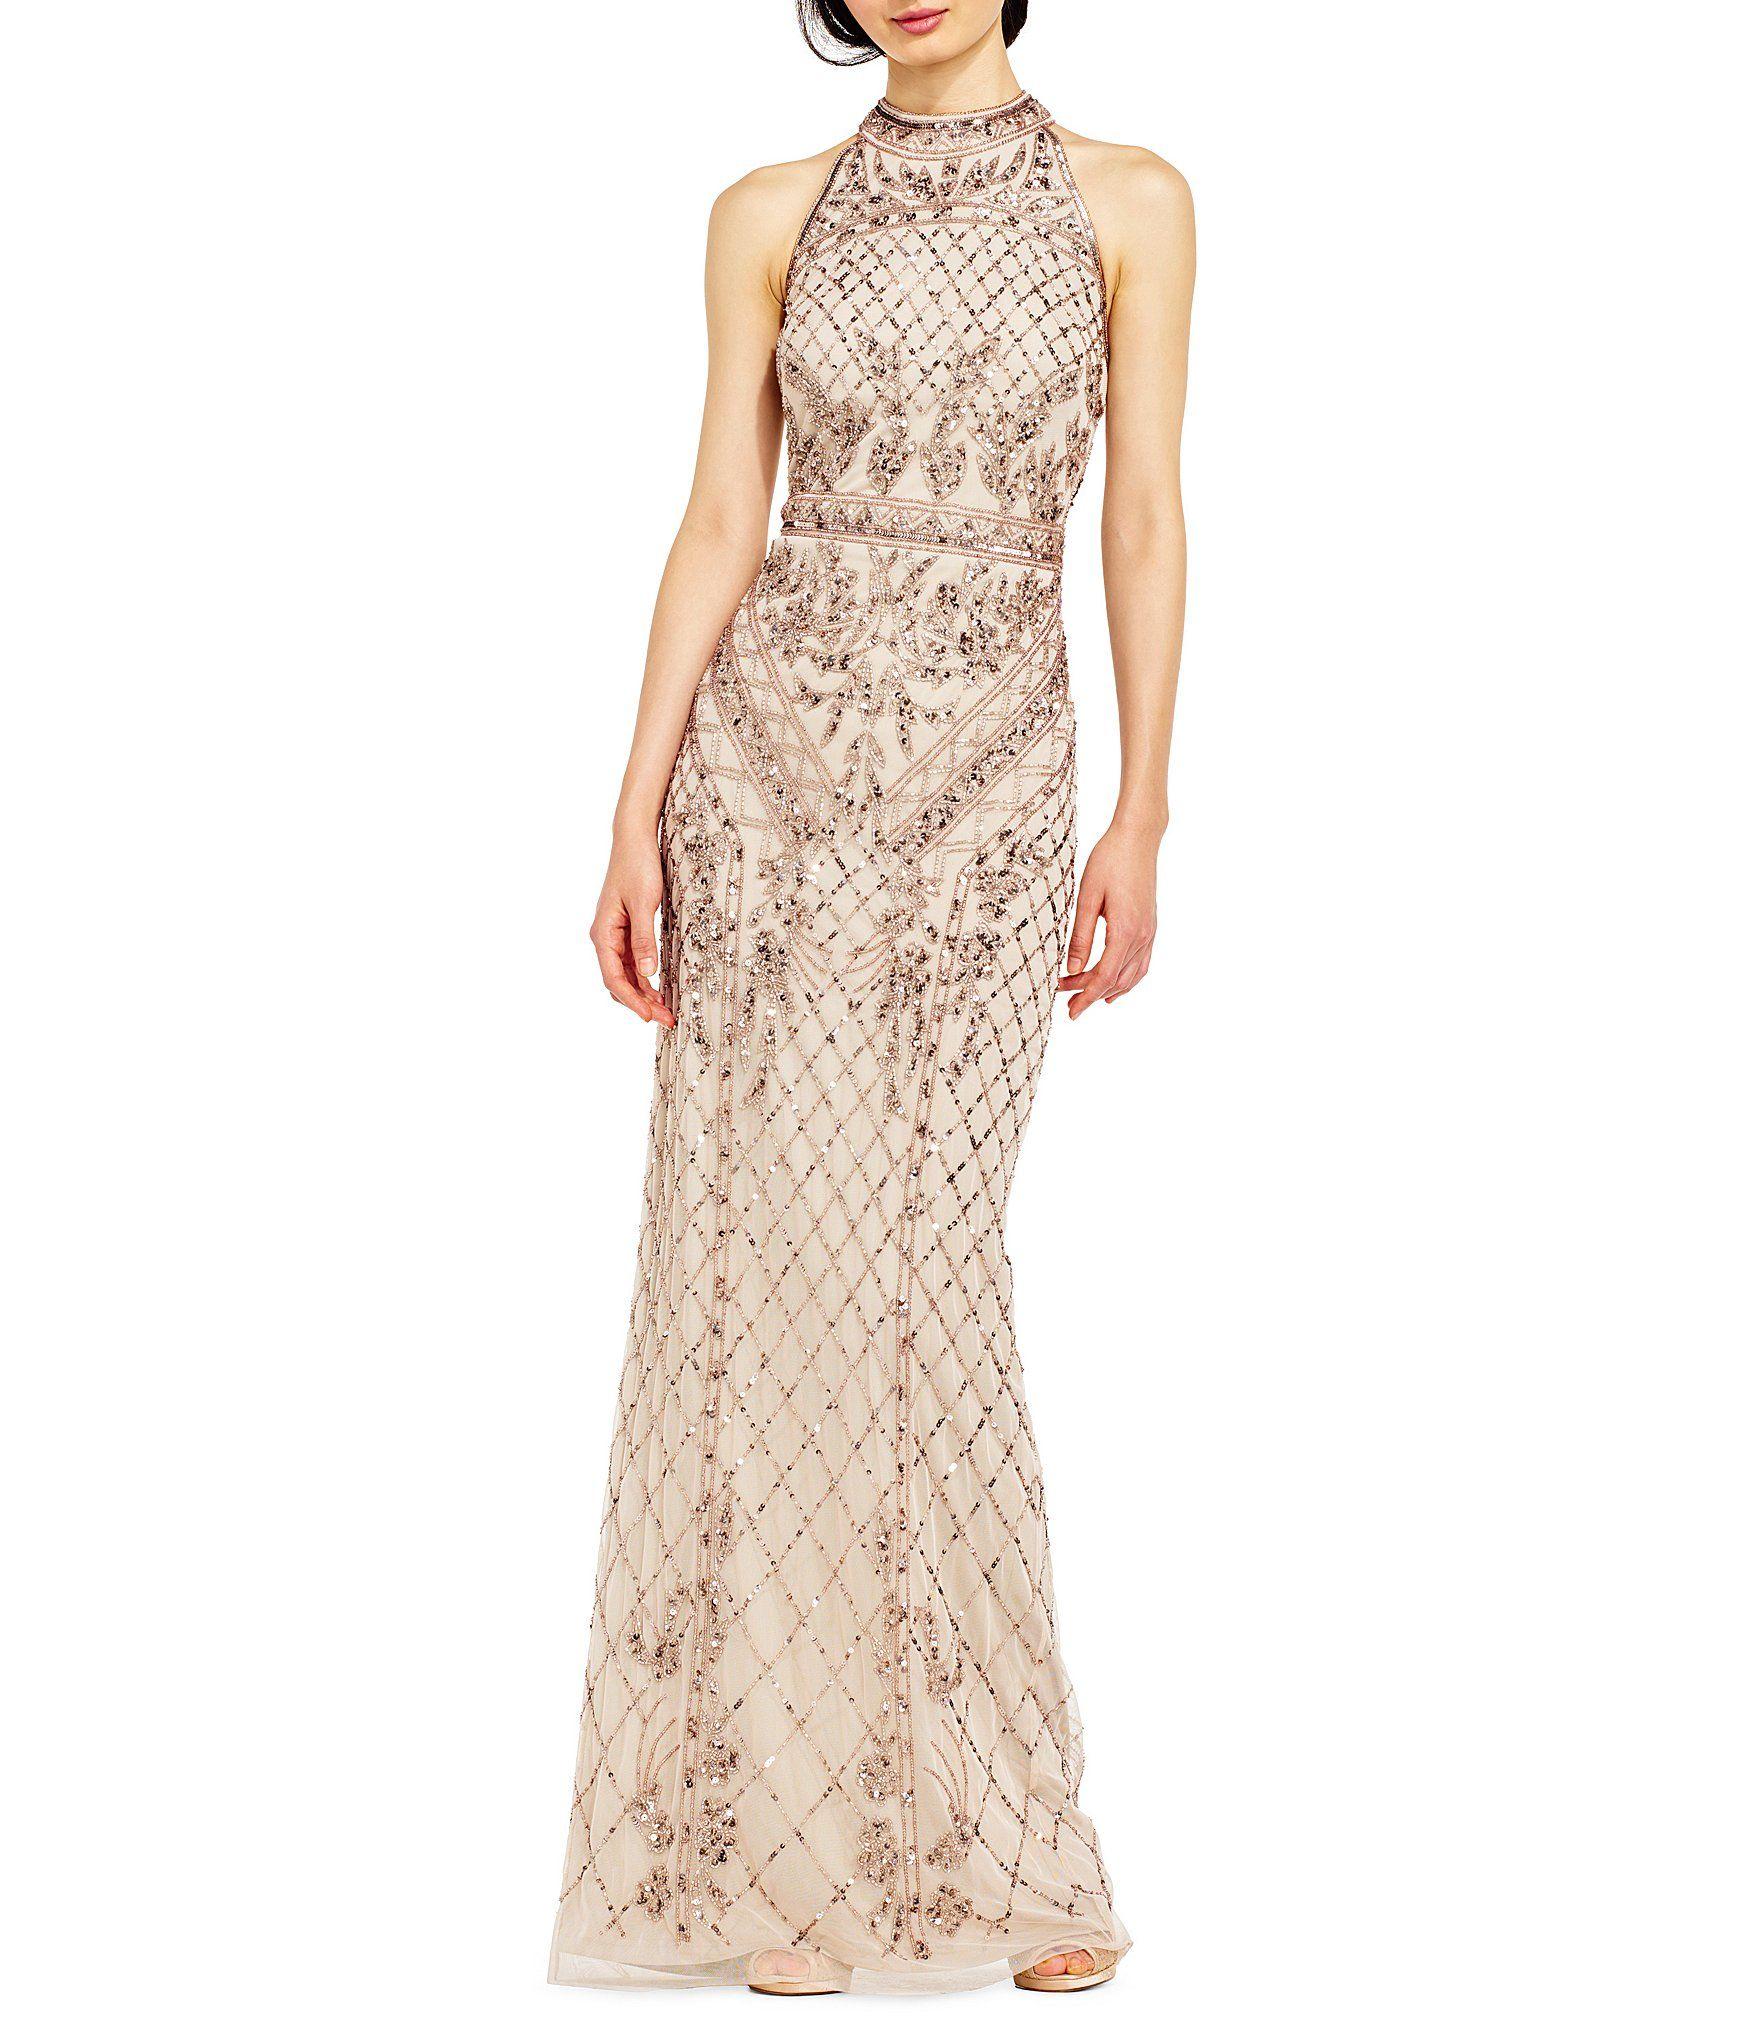 be6e84da59e Shop for Adrianna Papell Halter Beaded Column Gown at Dillards.com. Visit  Dillards.com to find clothing